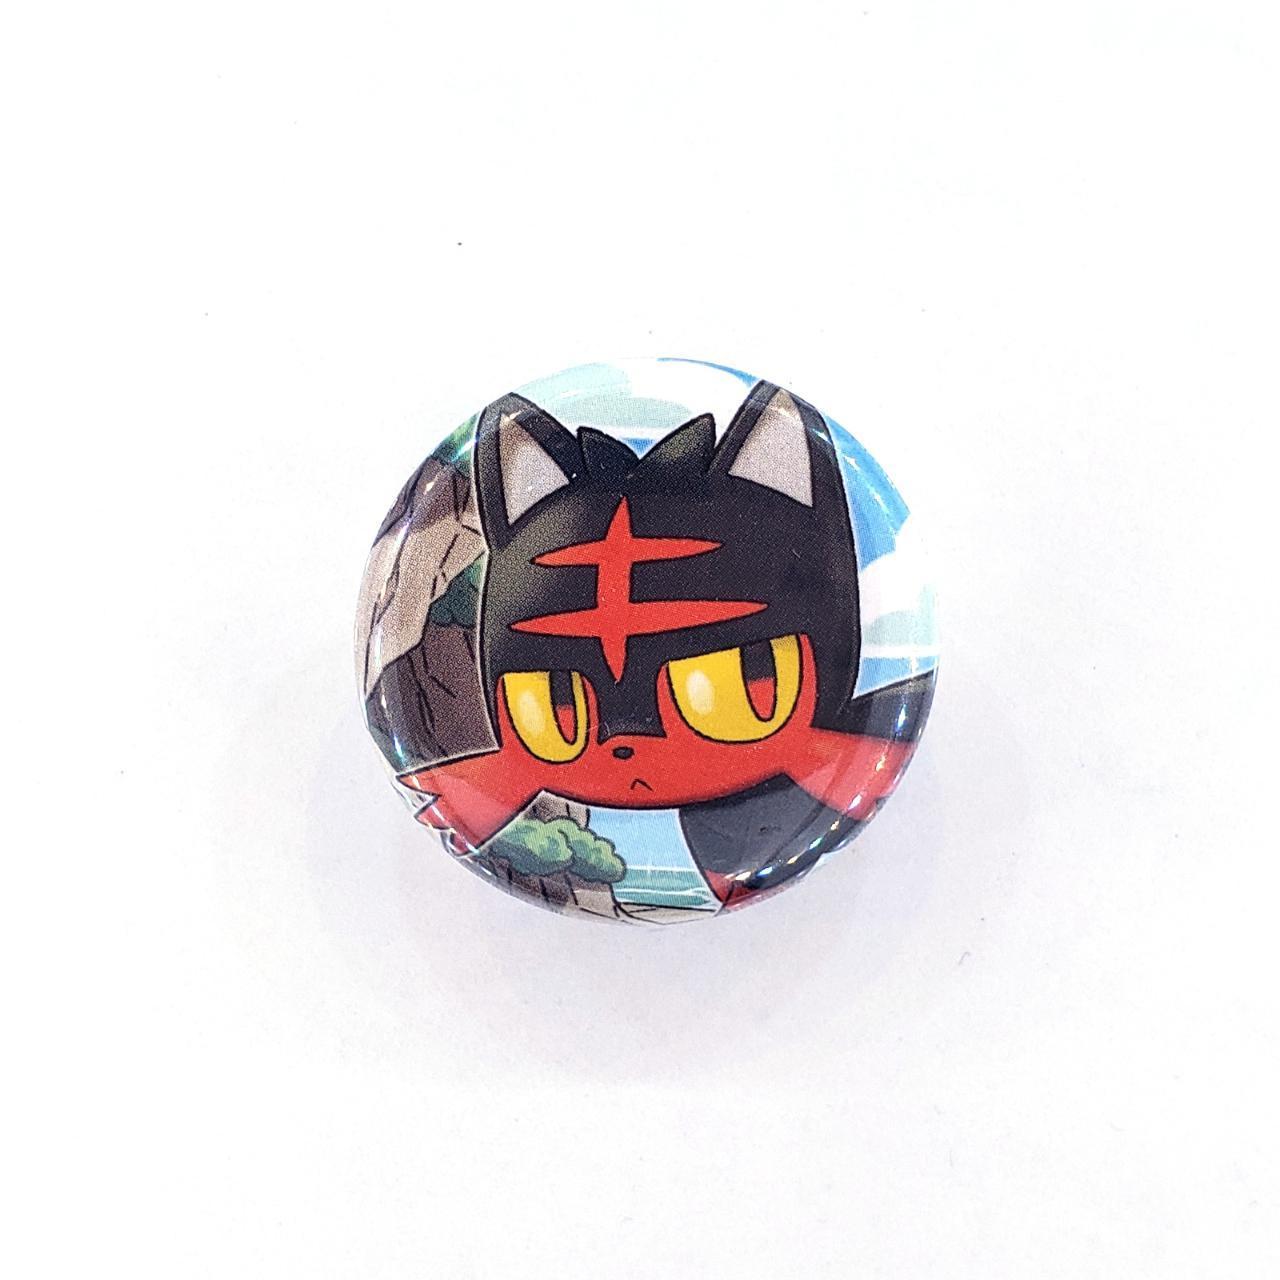 Product Image 1 - Litten Pokémon Collet Back Pin